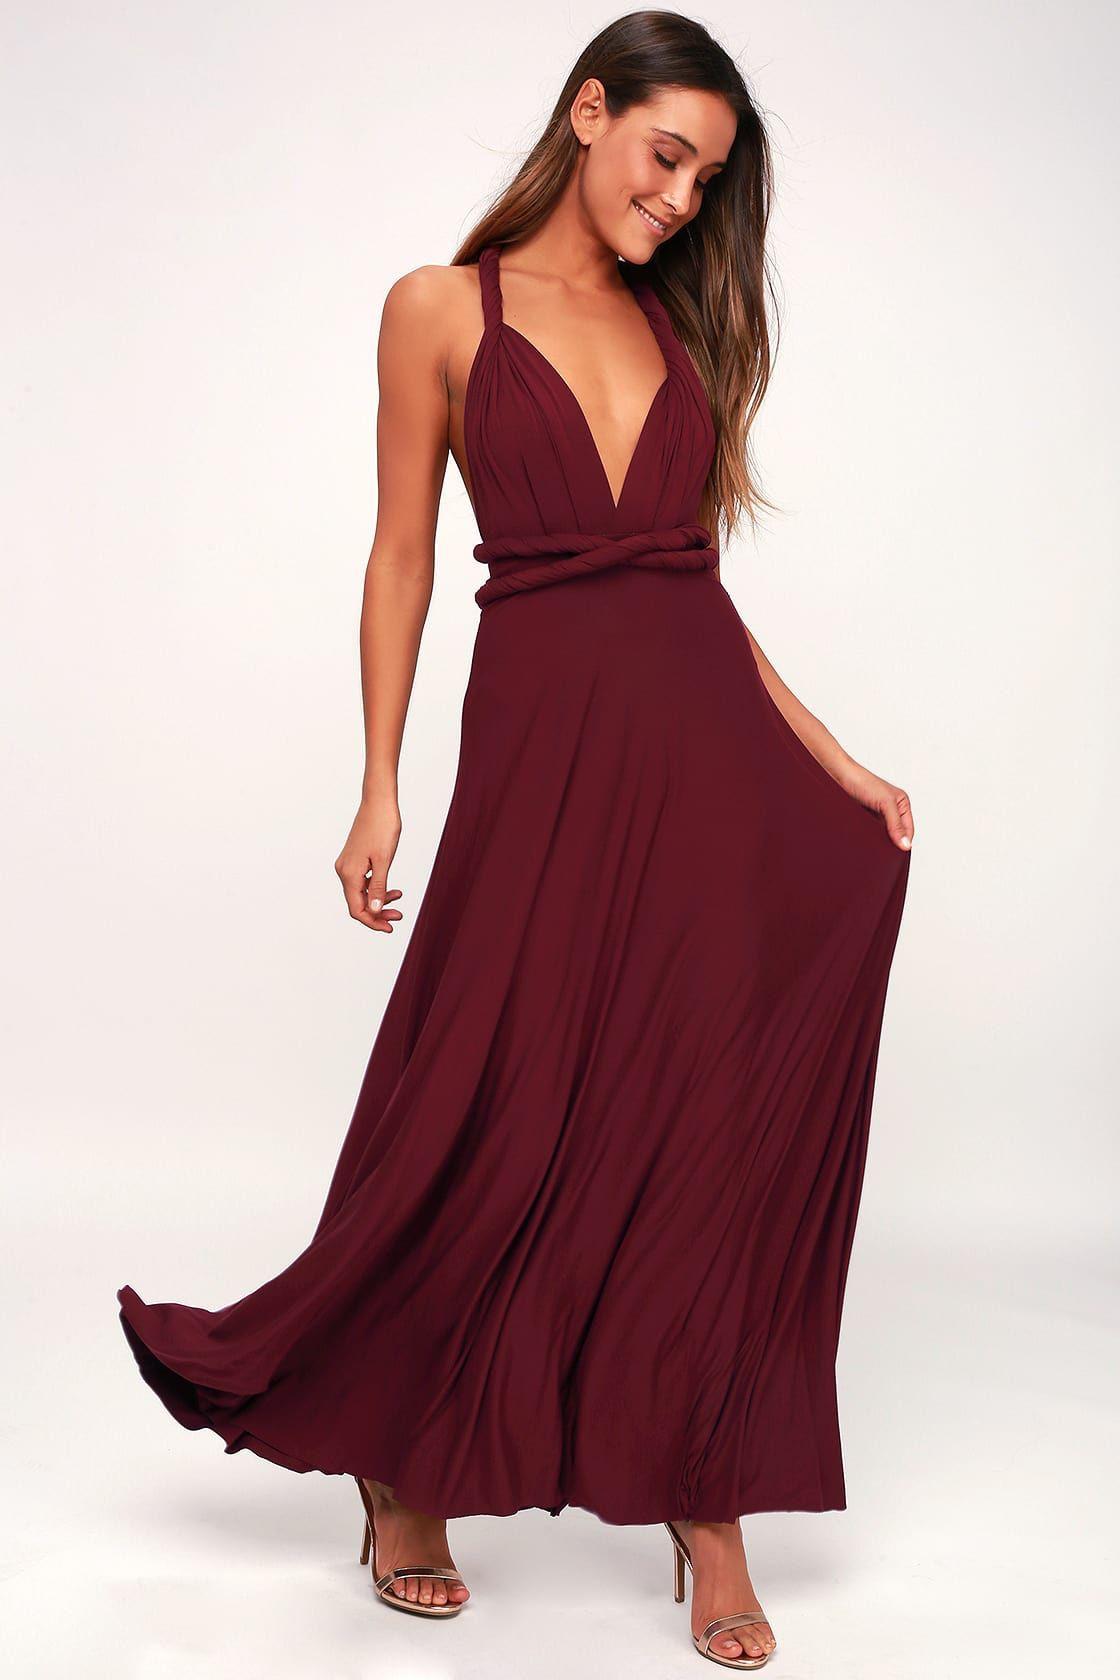 Brand New Wine Formal Dress!